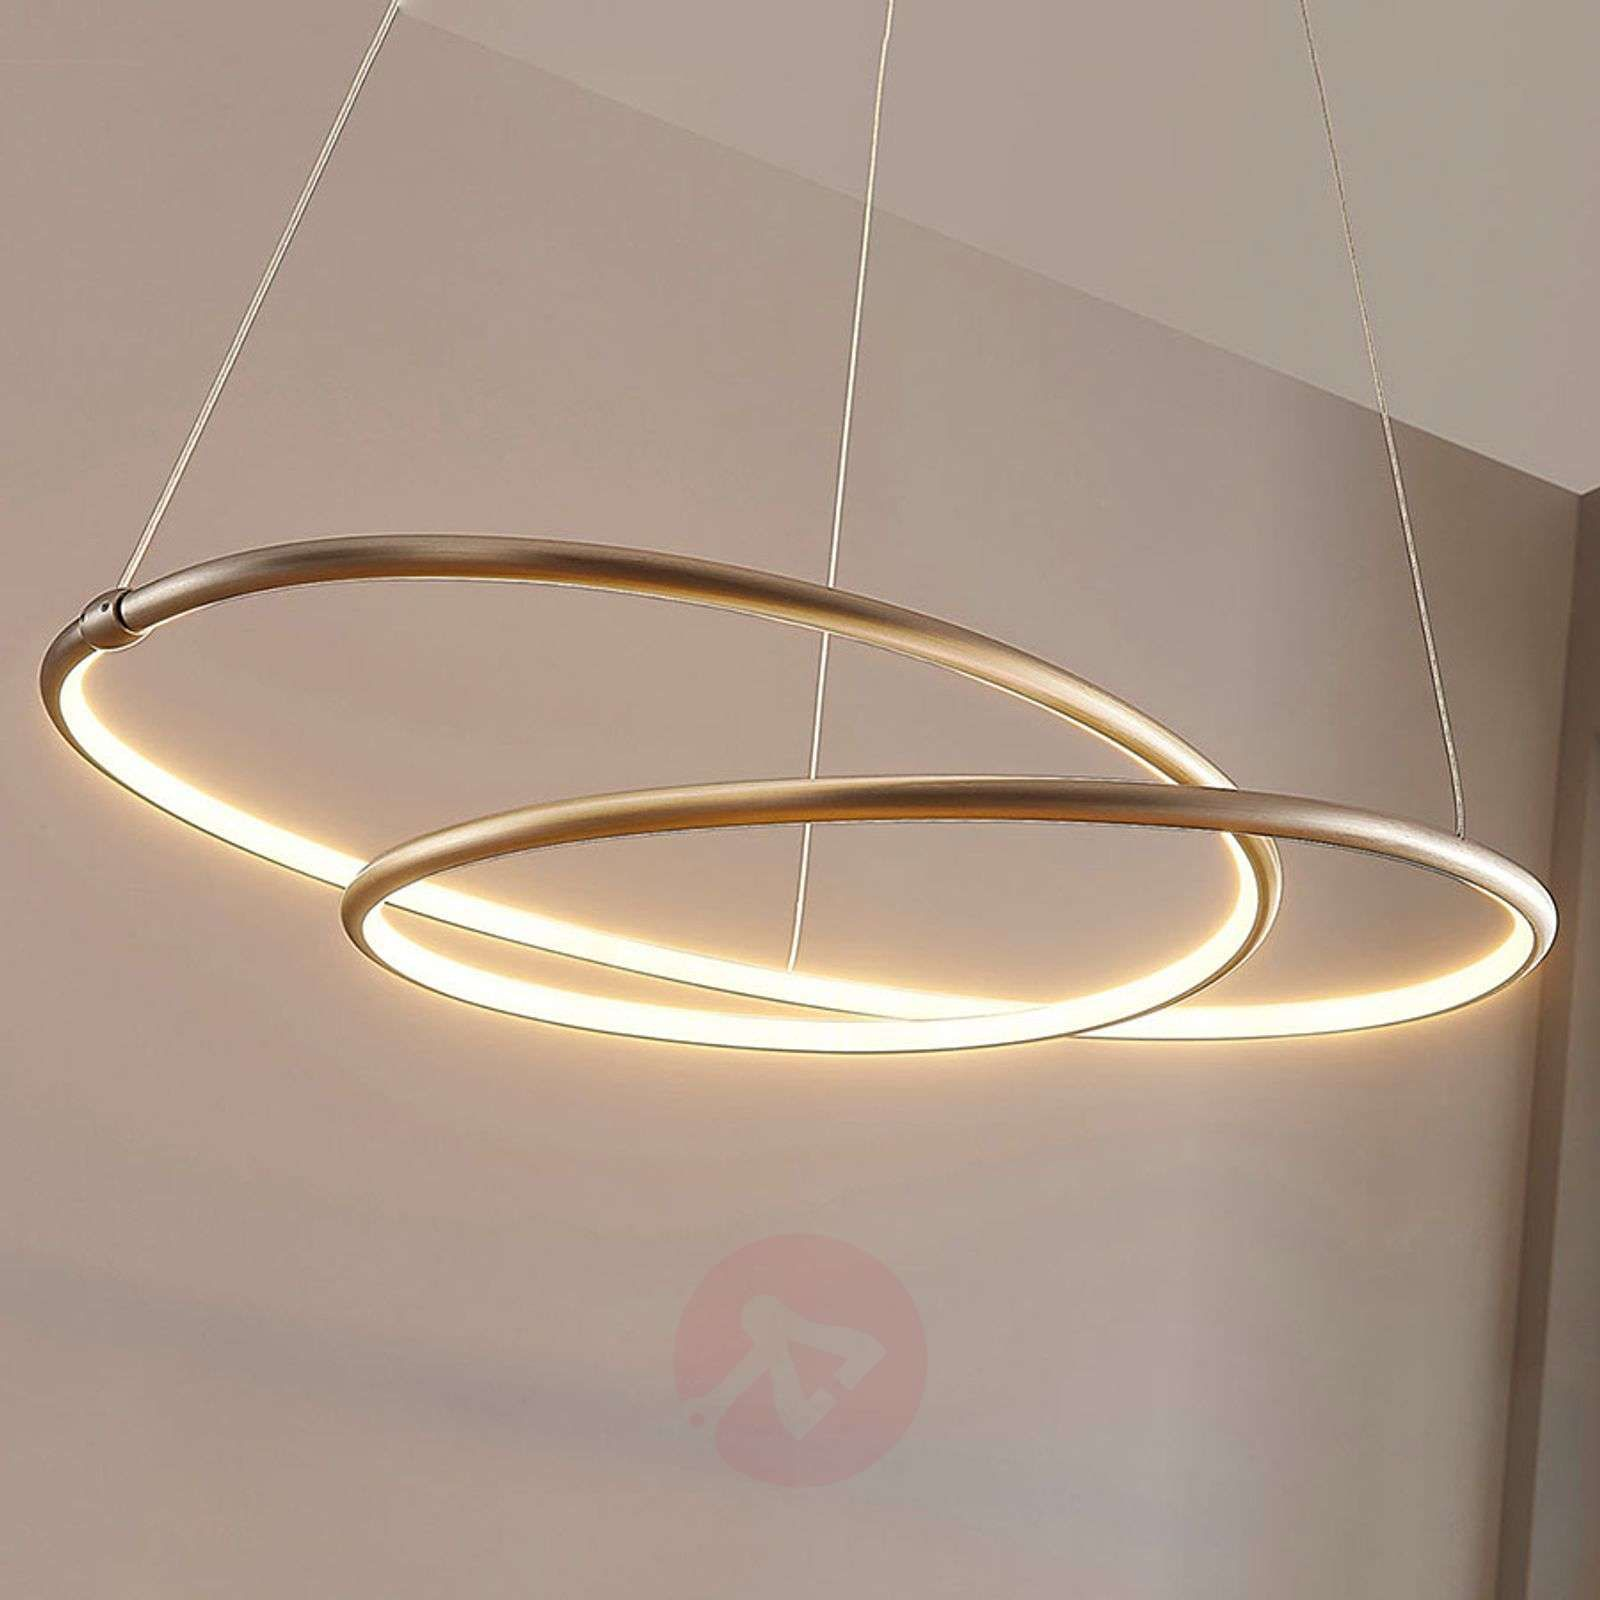 lampa szklana | lampy do salonu sufitowe | nowoczesne lampy